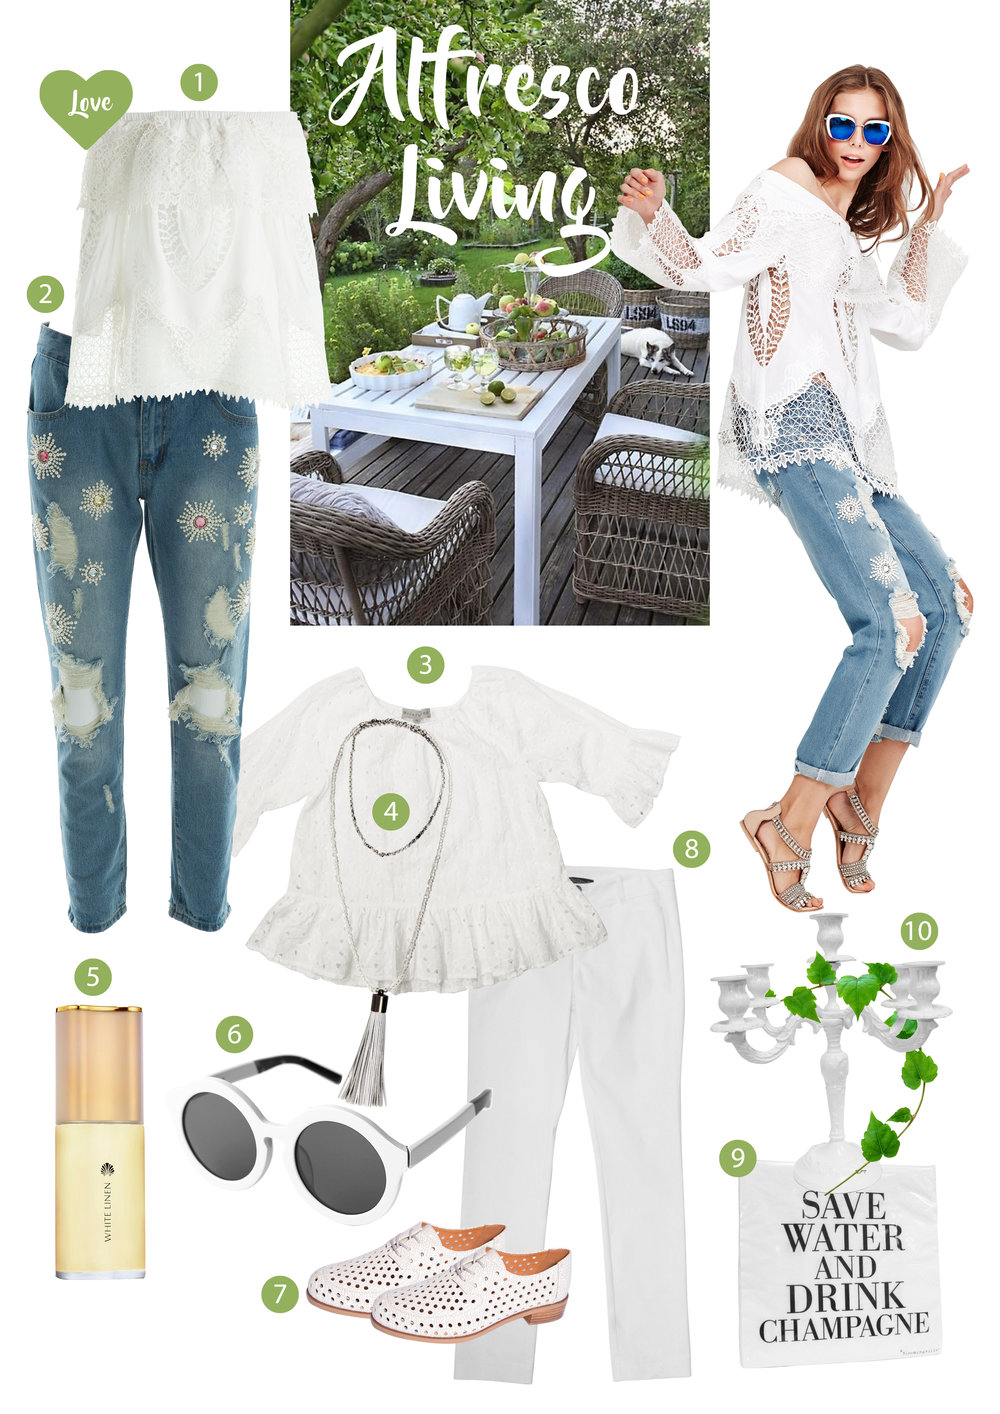 Karen jordan style  Style selection promotion